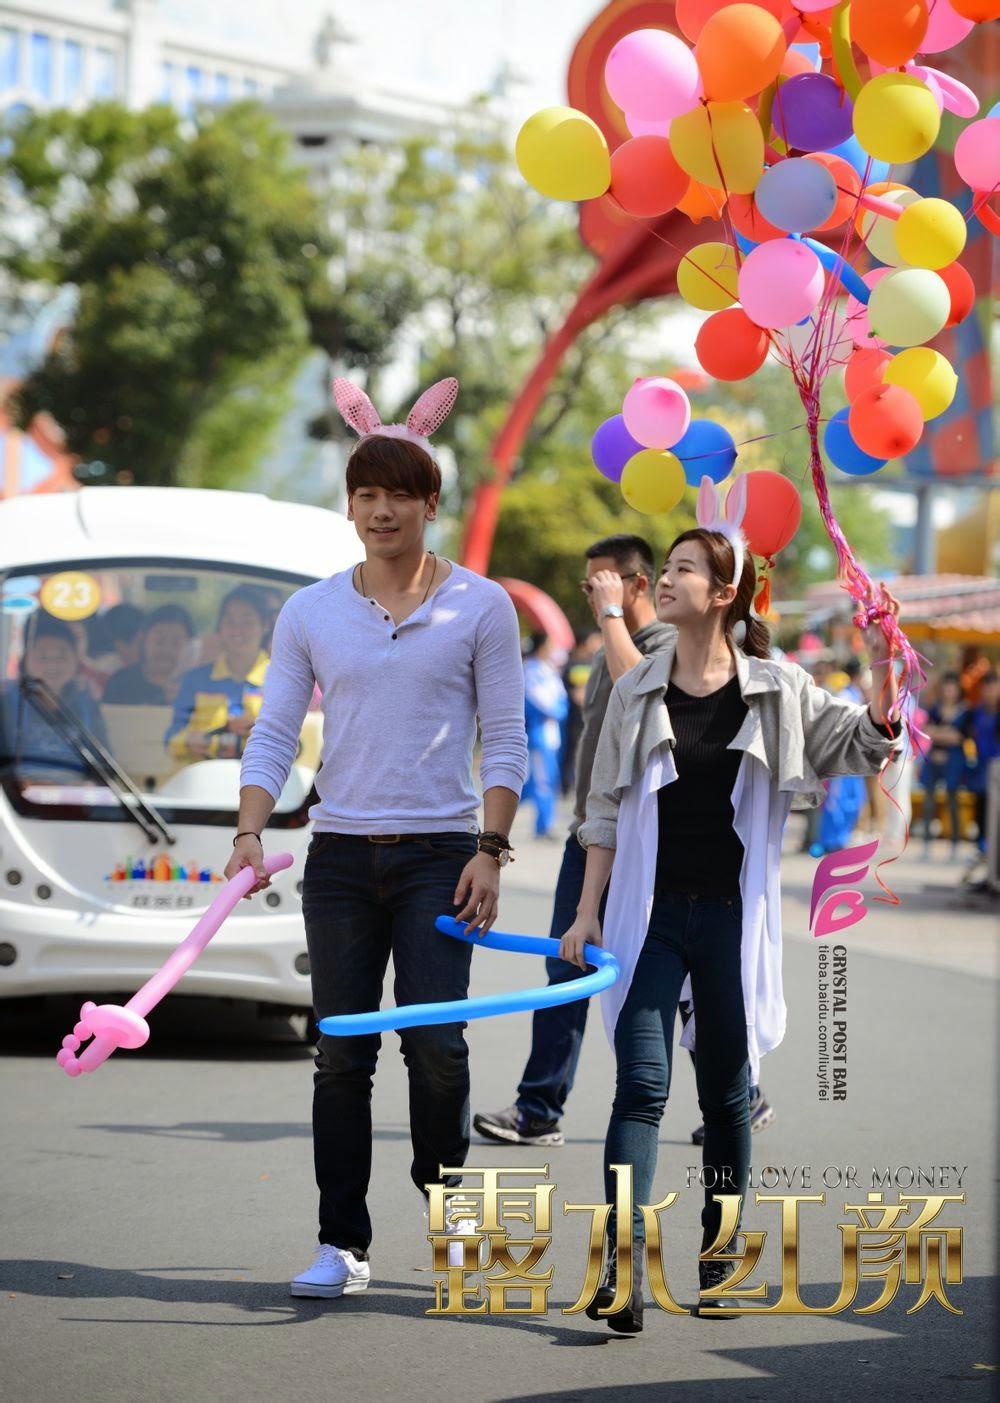 Rain 中国映画 露水紅顔_c0047605_8125539.jpg